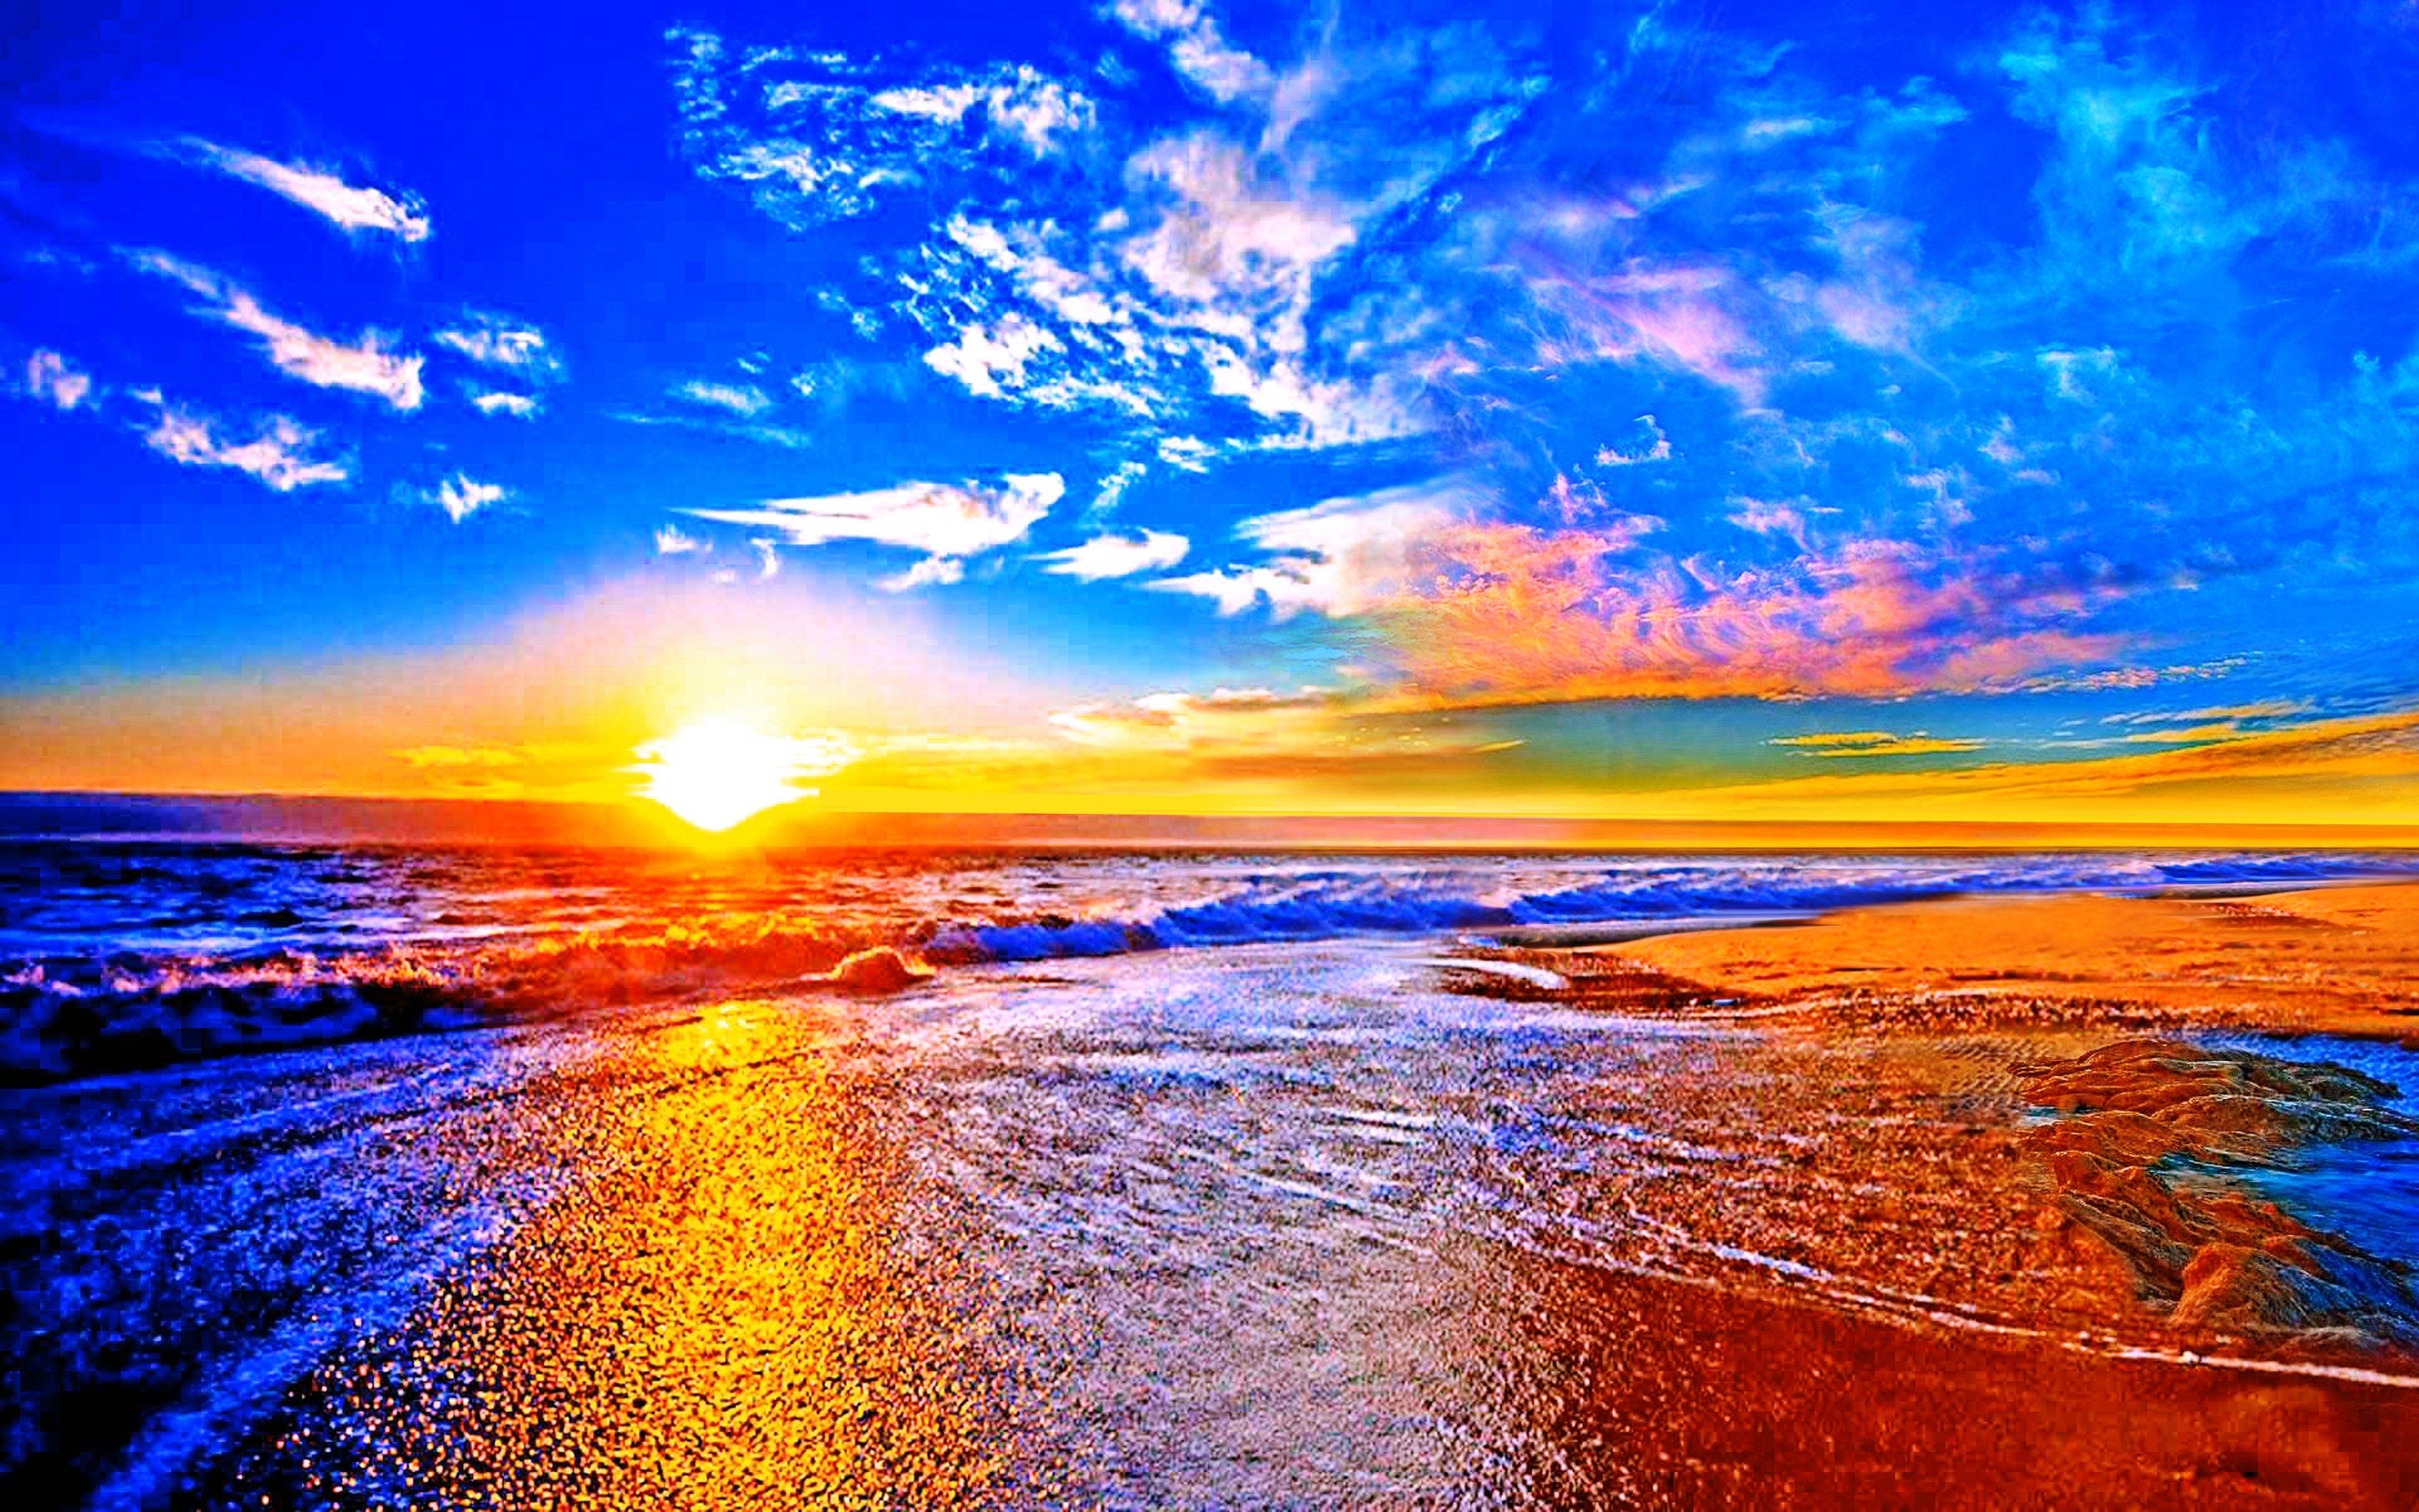 timbeta ajuda #timbeta | sunrises - sunsets | pinterest | wallpaper